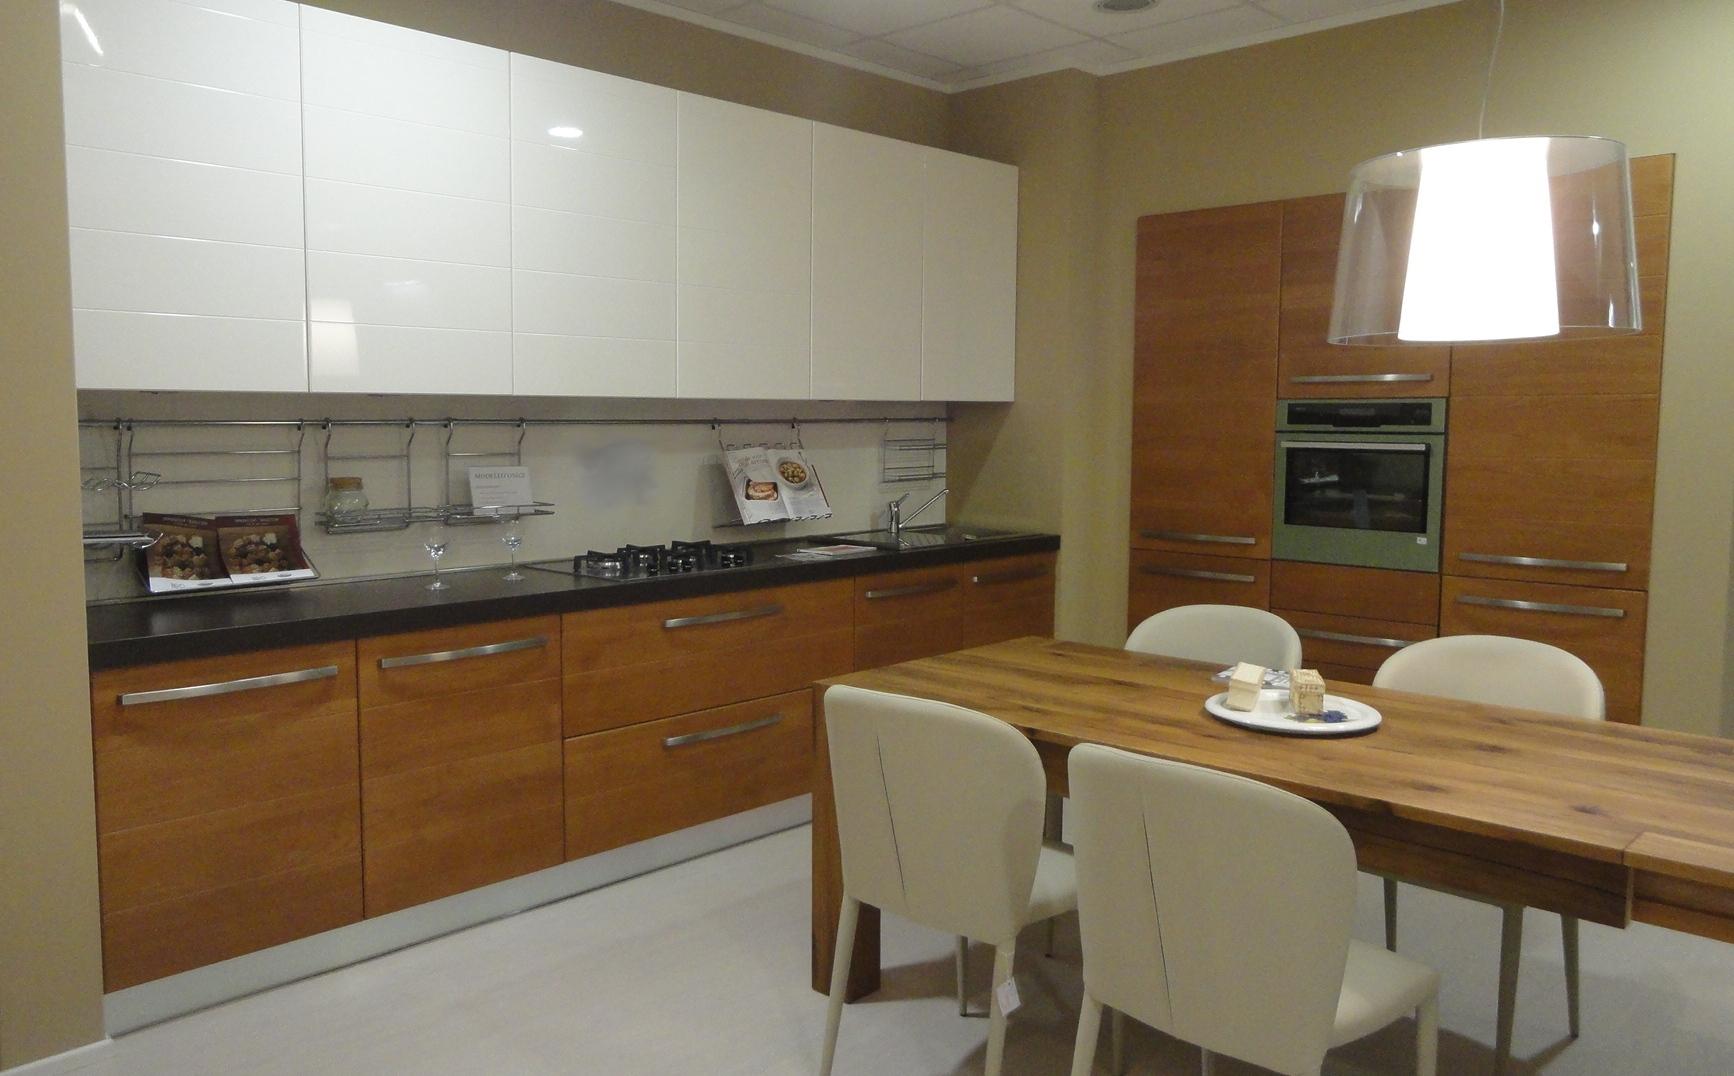 Beautiful Verniciare Pensili Cucina Gallery - Home Interior Ideas ...